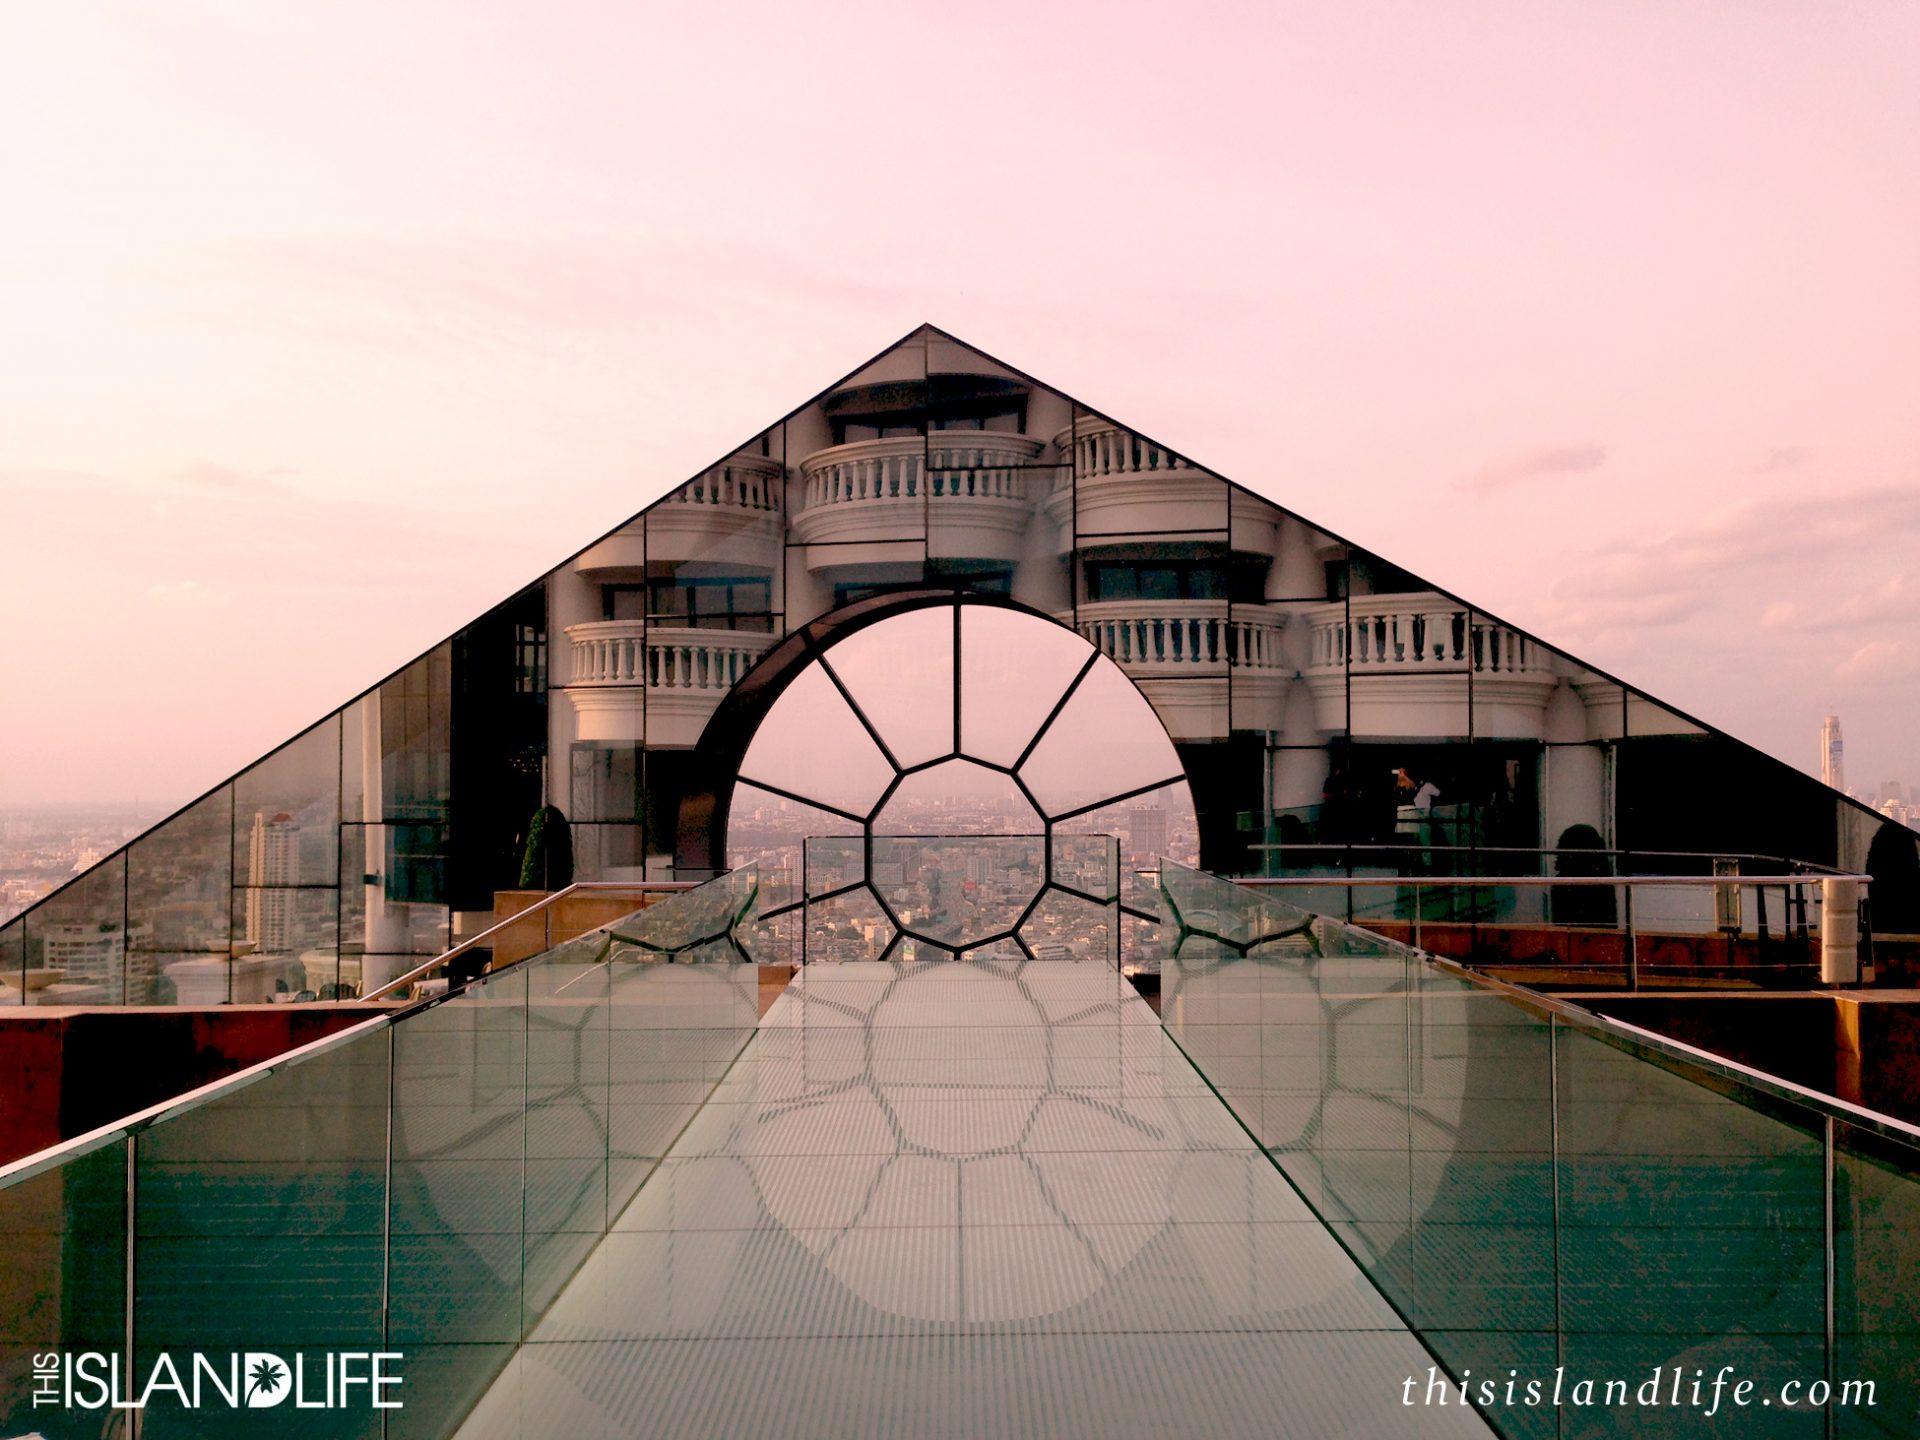 this-island-life-sky-bar-sirocco-lebua-state-tower-bangkok-thailand-1-wm